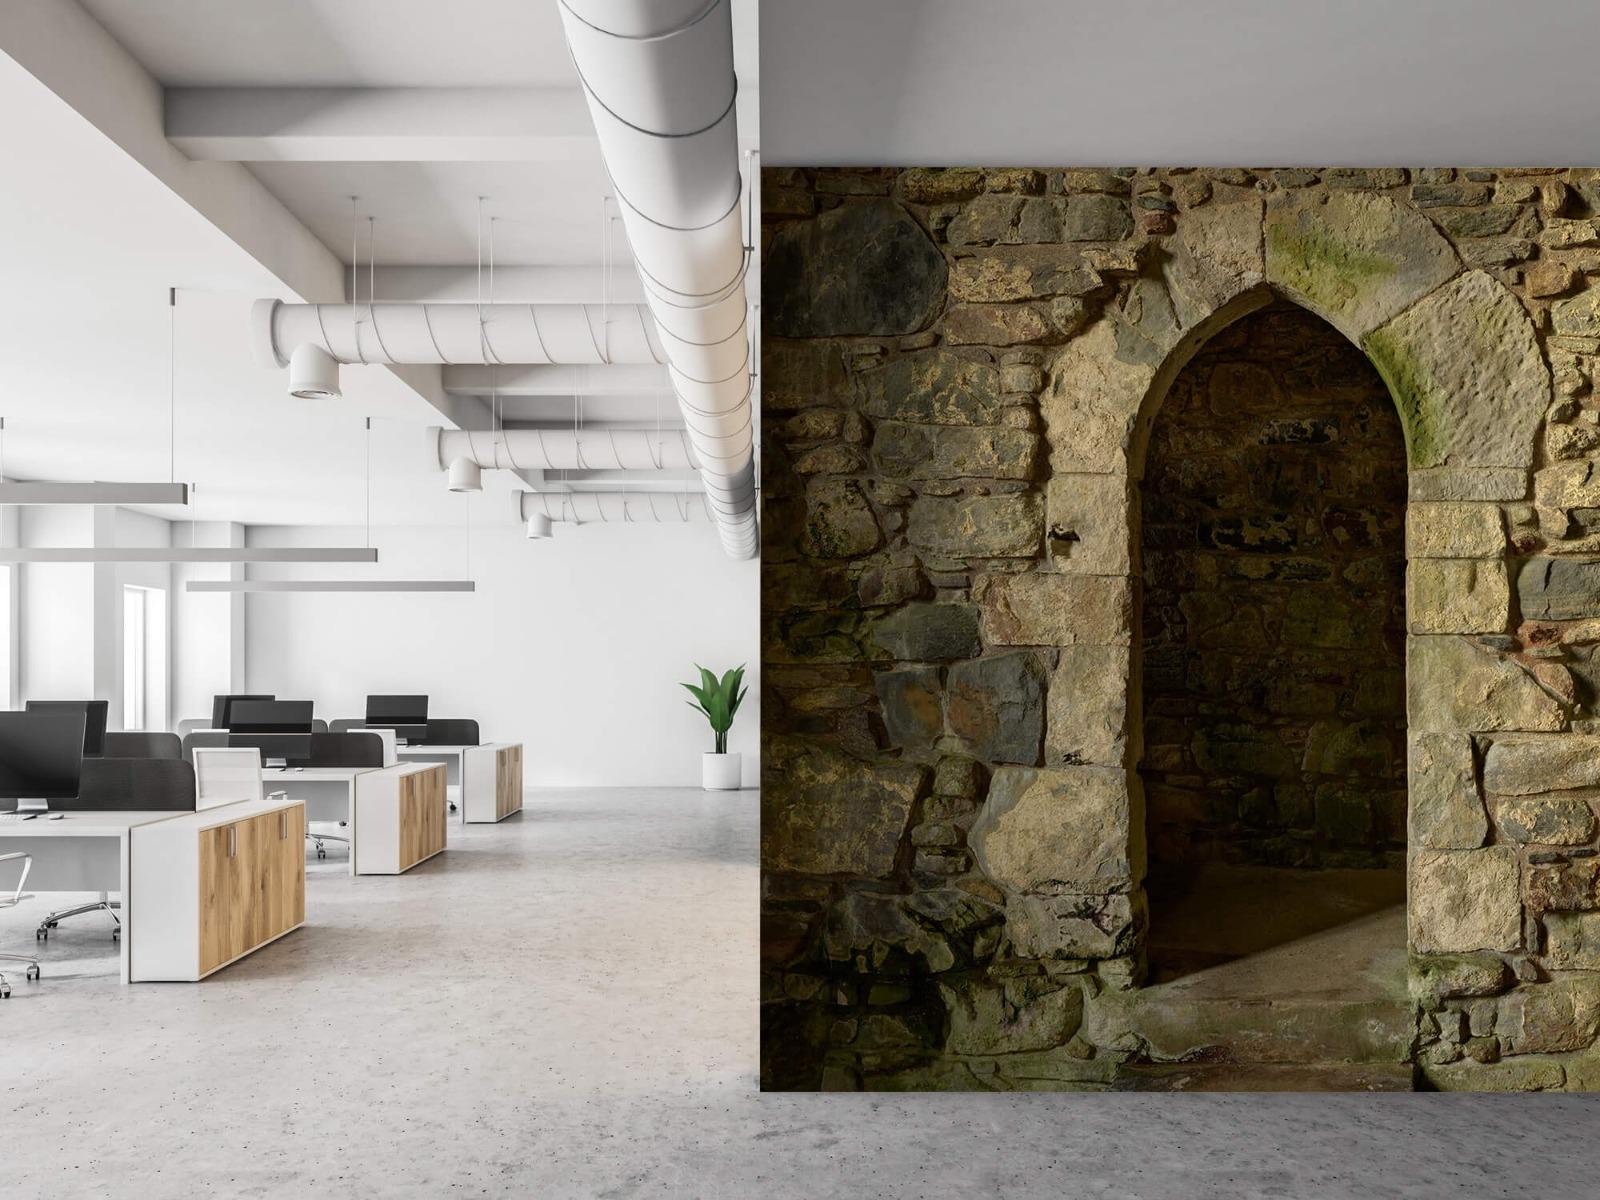 Steen behang - Oude muur met doorgang - Slaapkamer 21